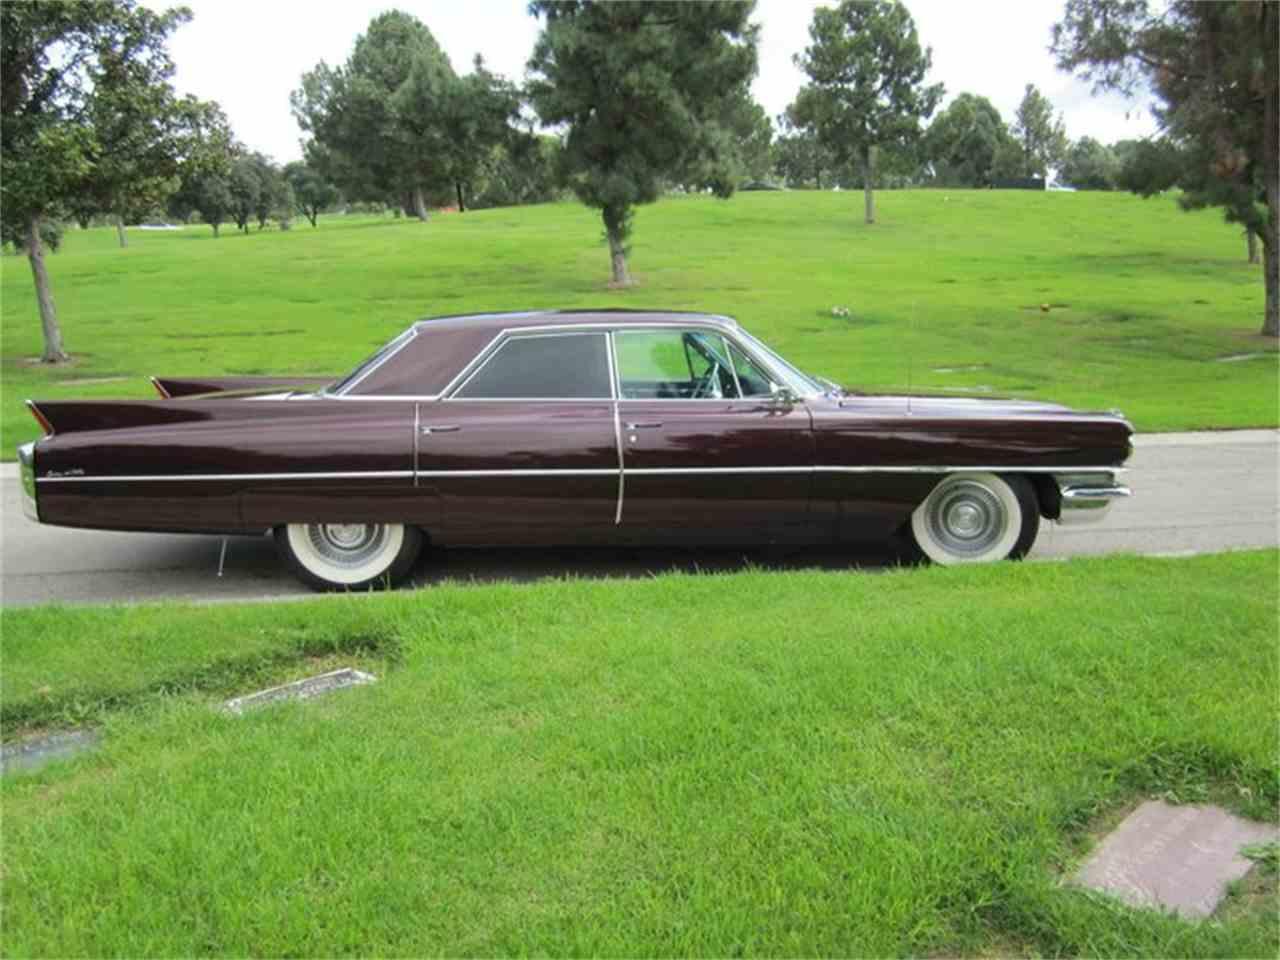 1963 Cadillac Sedan DeVille for Sale - CC-599867